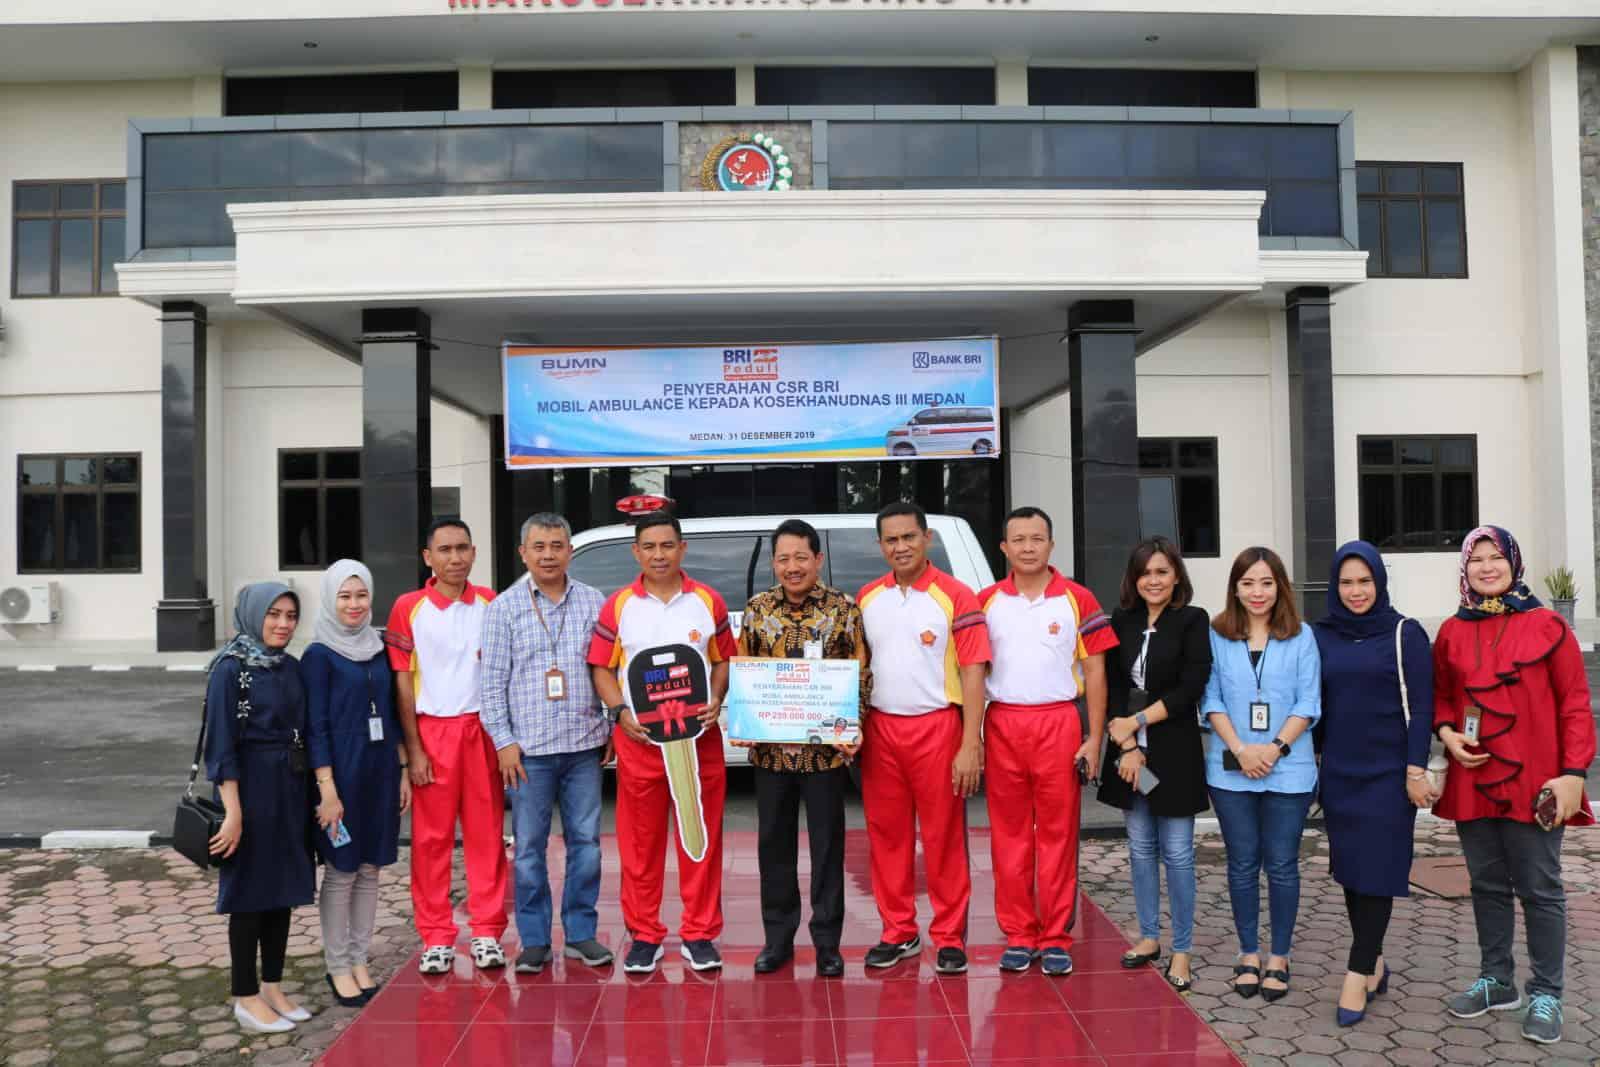 Penyerahan CSR BRI Mobil Ambulace Kepada Kosekhanudnas III